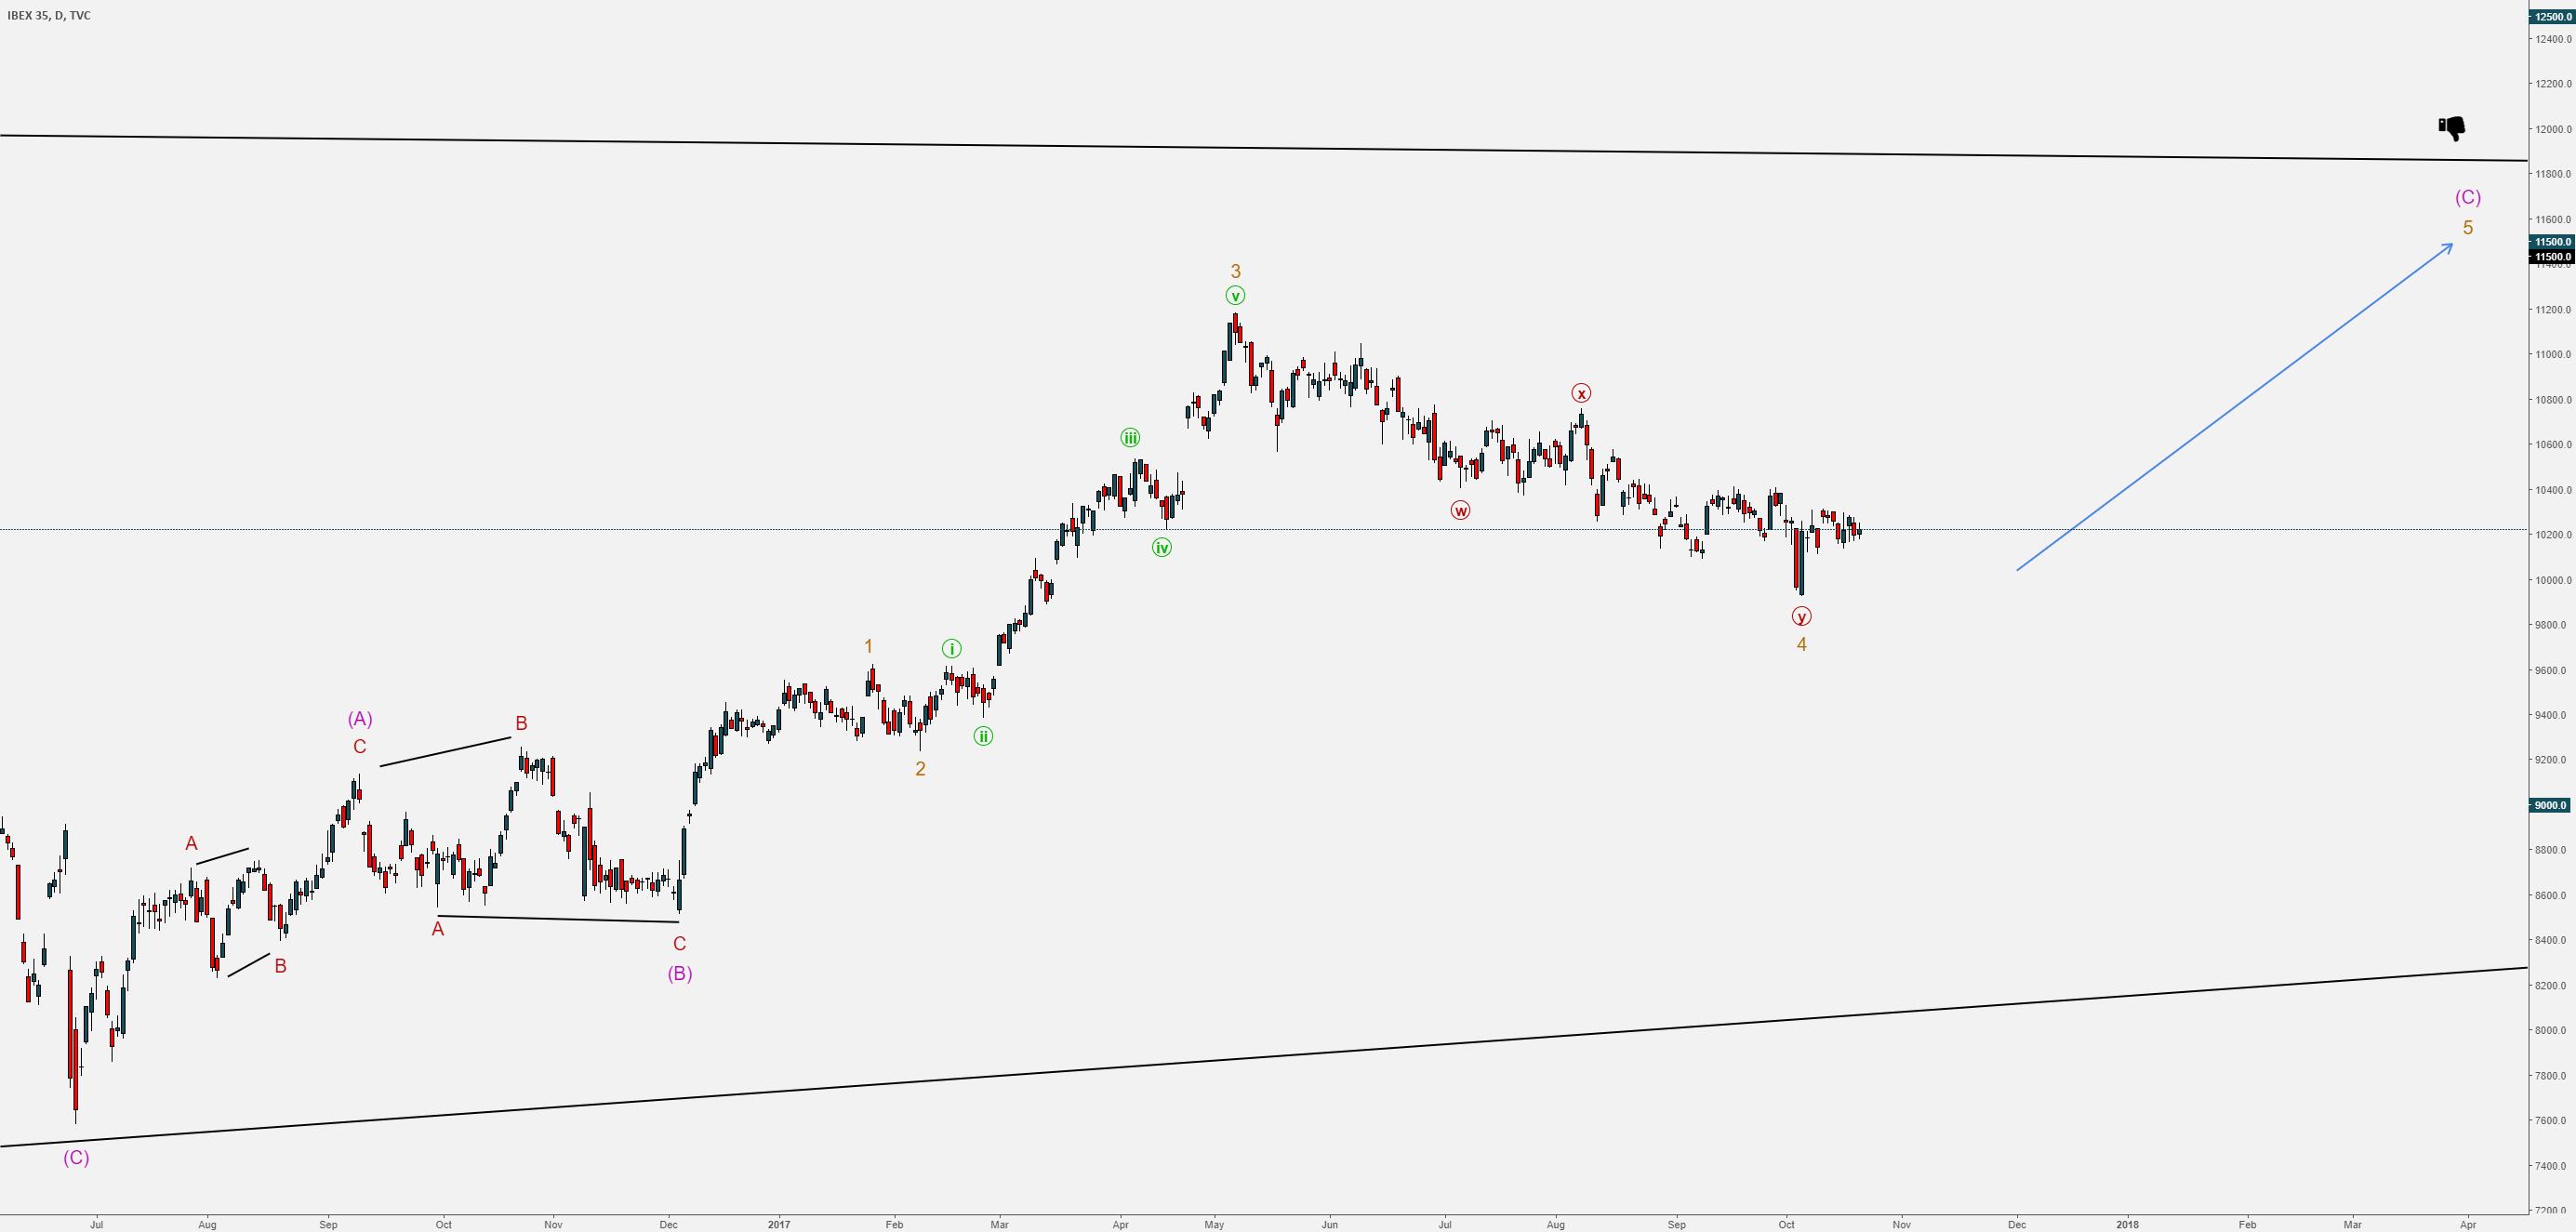 IBEX35 - Madrid Stock Exchange Crash - Daily